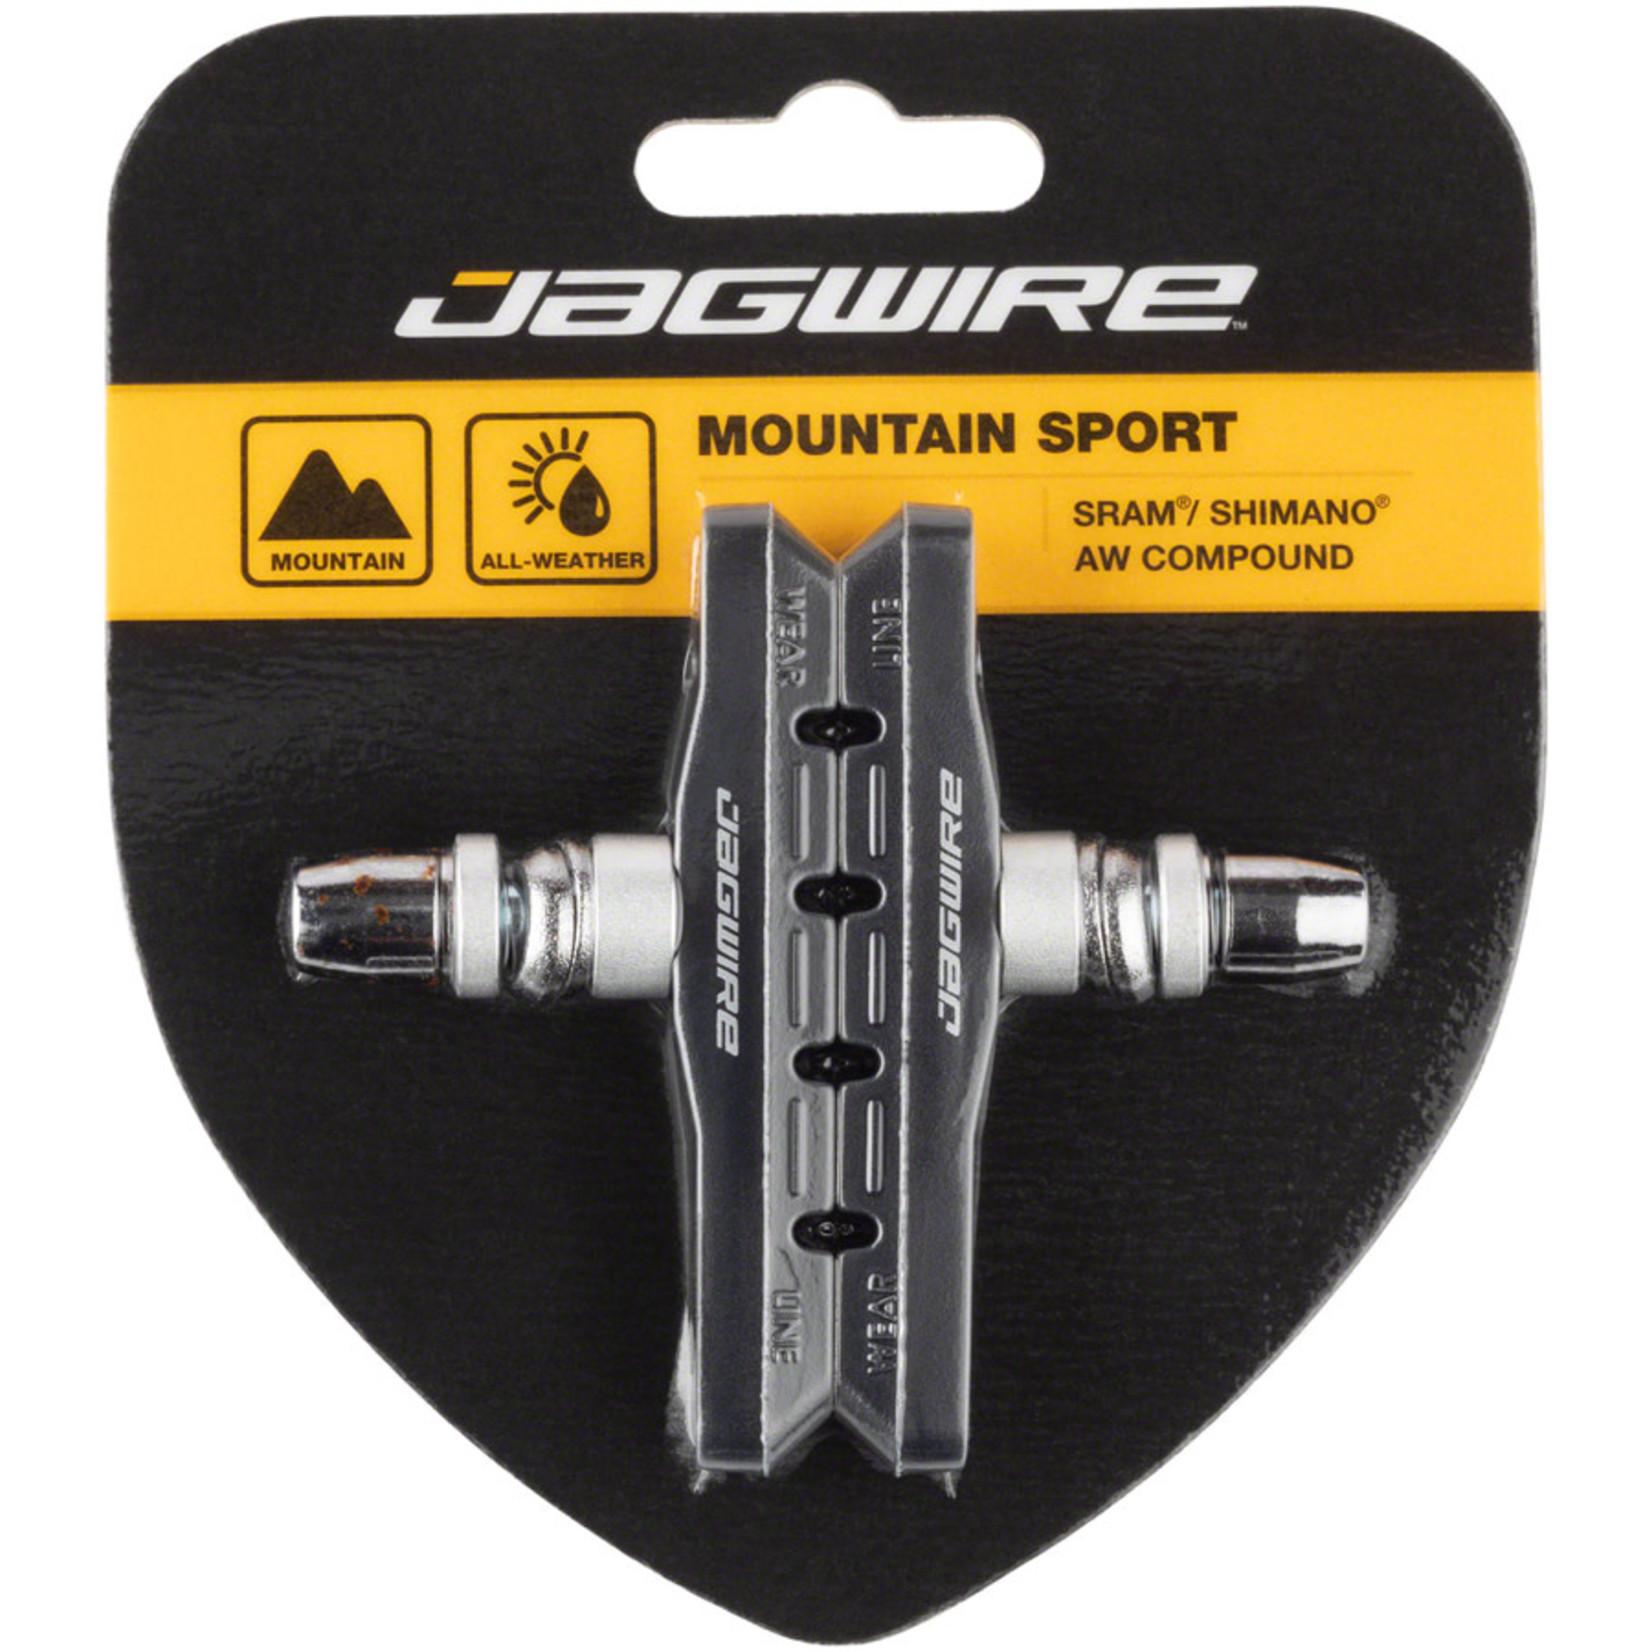 Jagwire Jagwire Mountain Sport Brake Pads Threaded Post Black